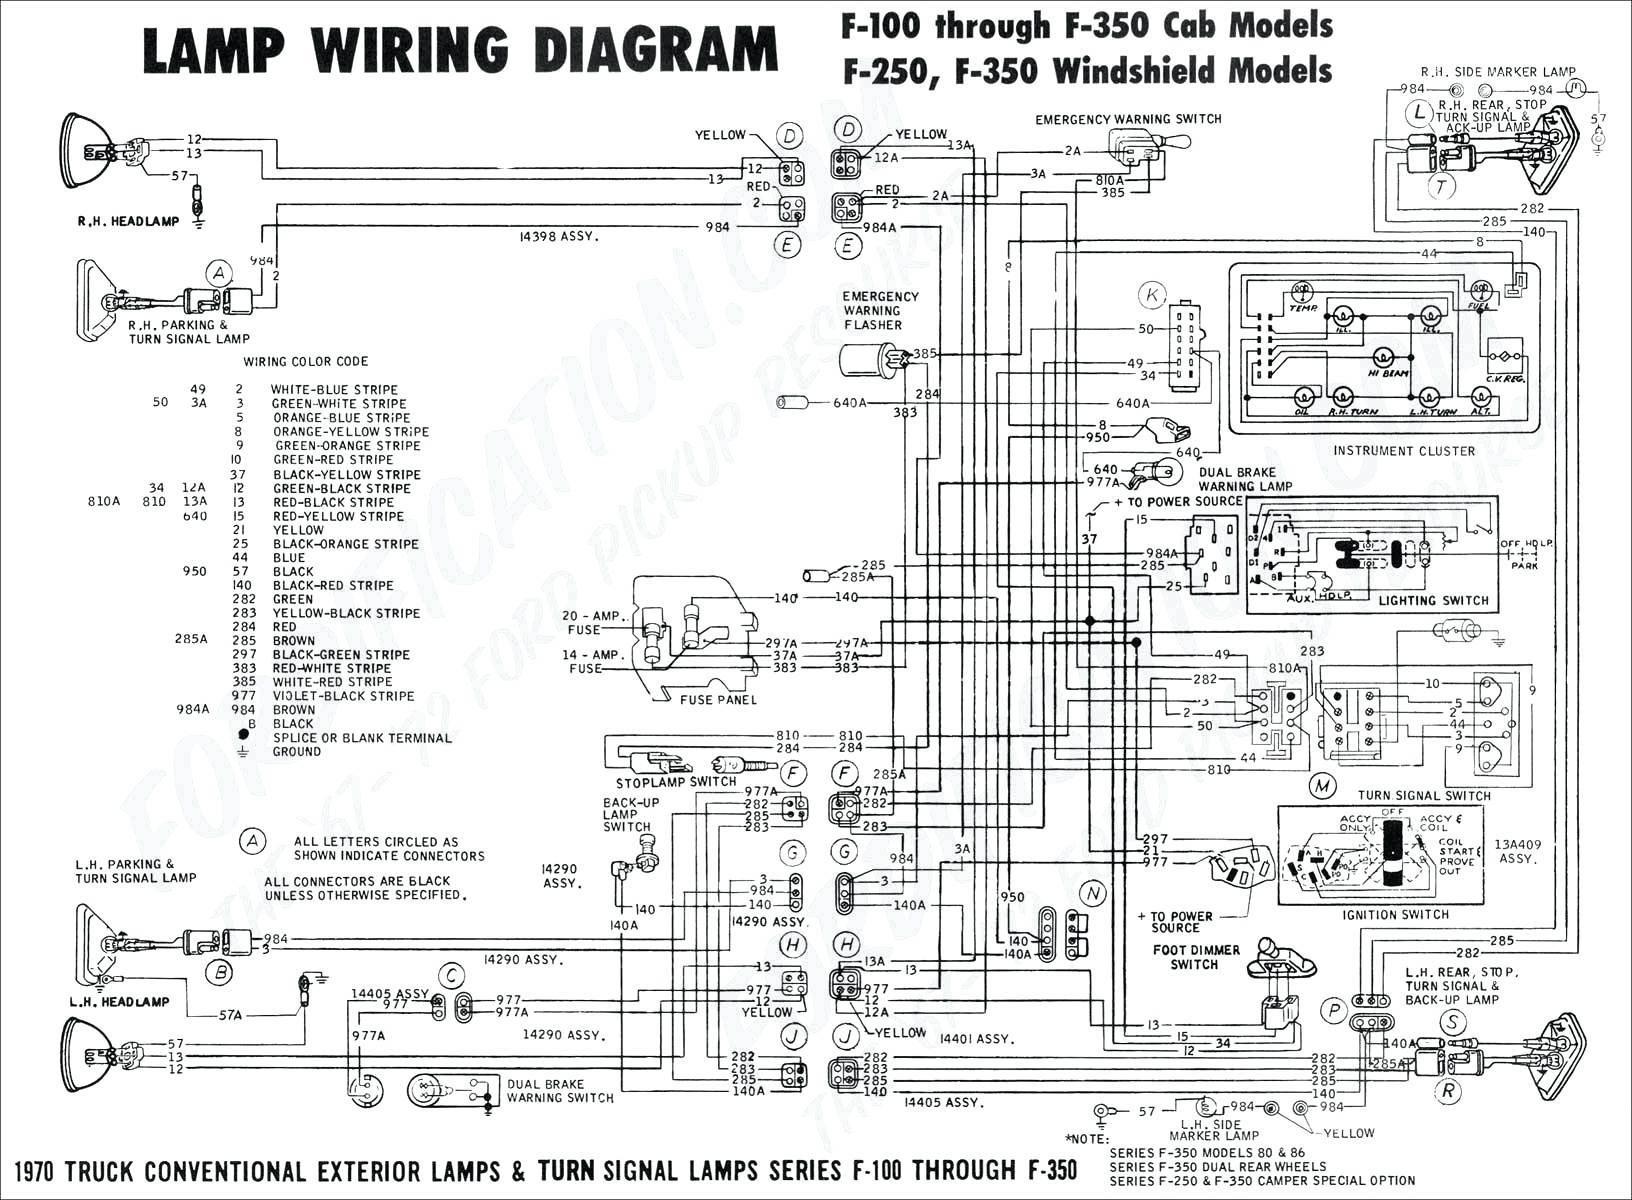 Obd2 Wire Diagram   Wiring Diagram - Data Link Connector Wiring Diagram